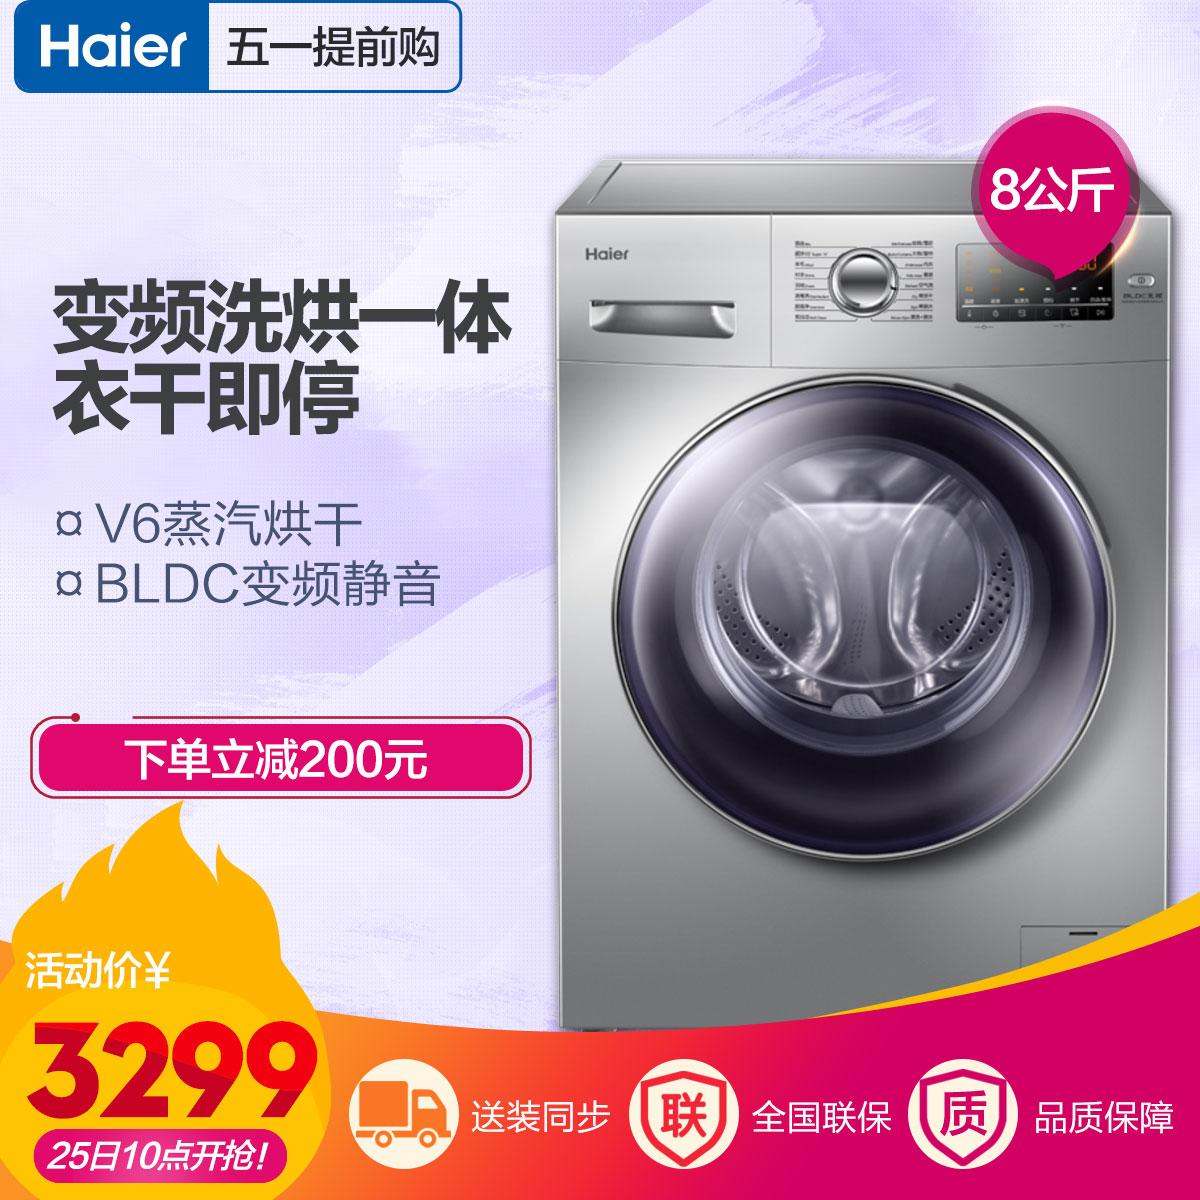 Haier/海尔 滚筒洗衣机 EG8014HB919SU1